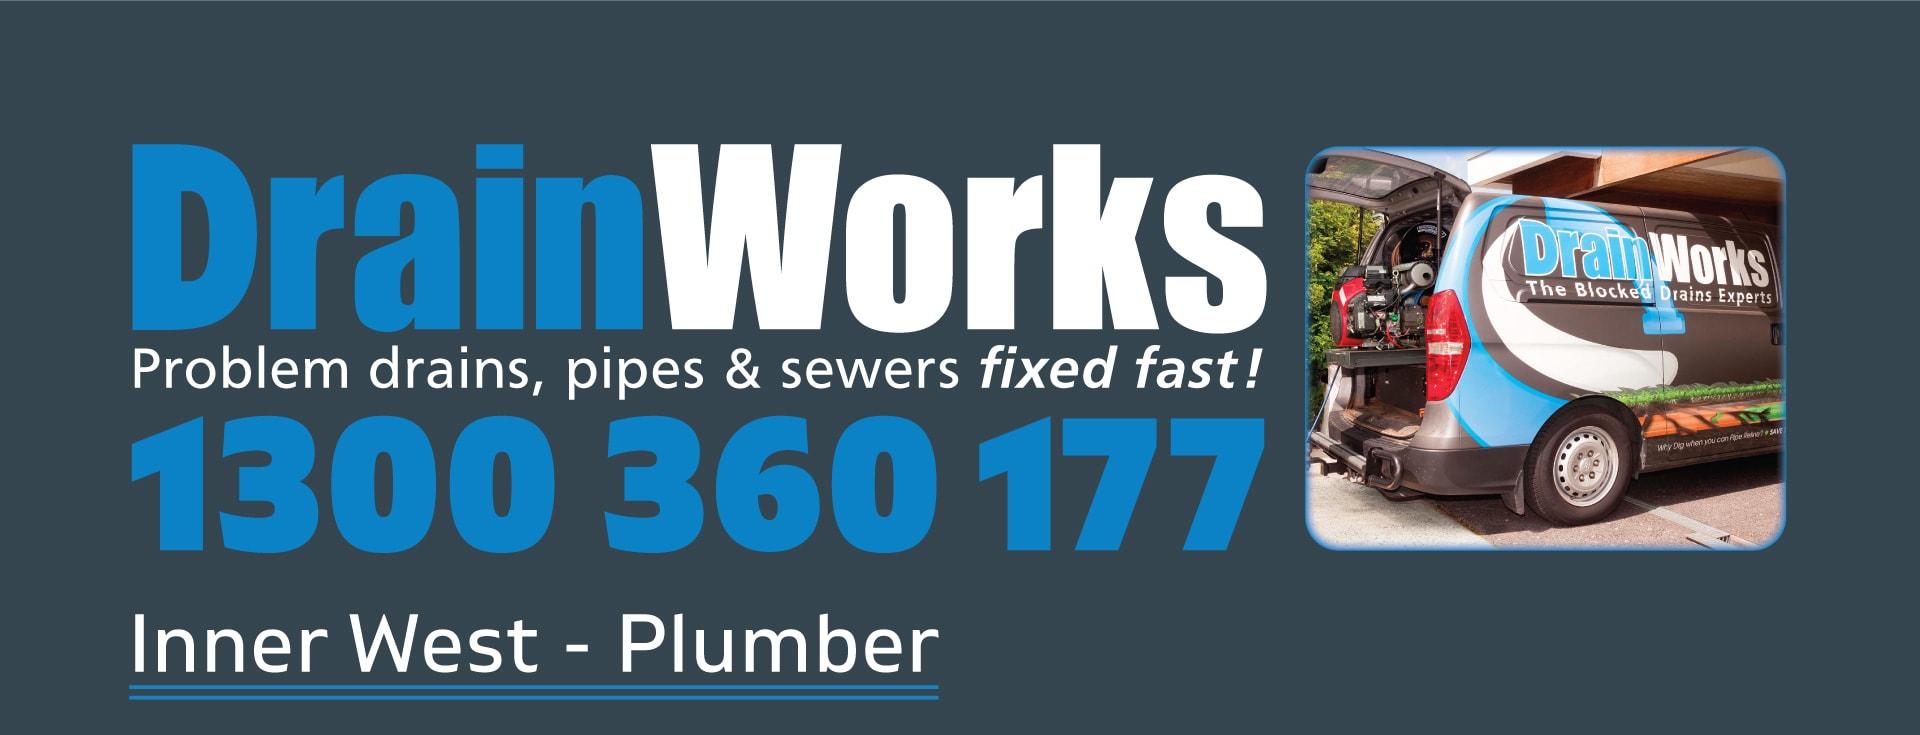 DrainWorks - Inner West Plumber